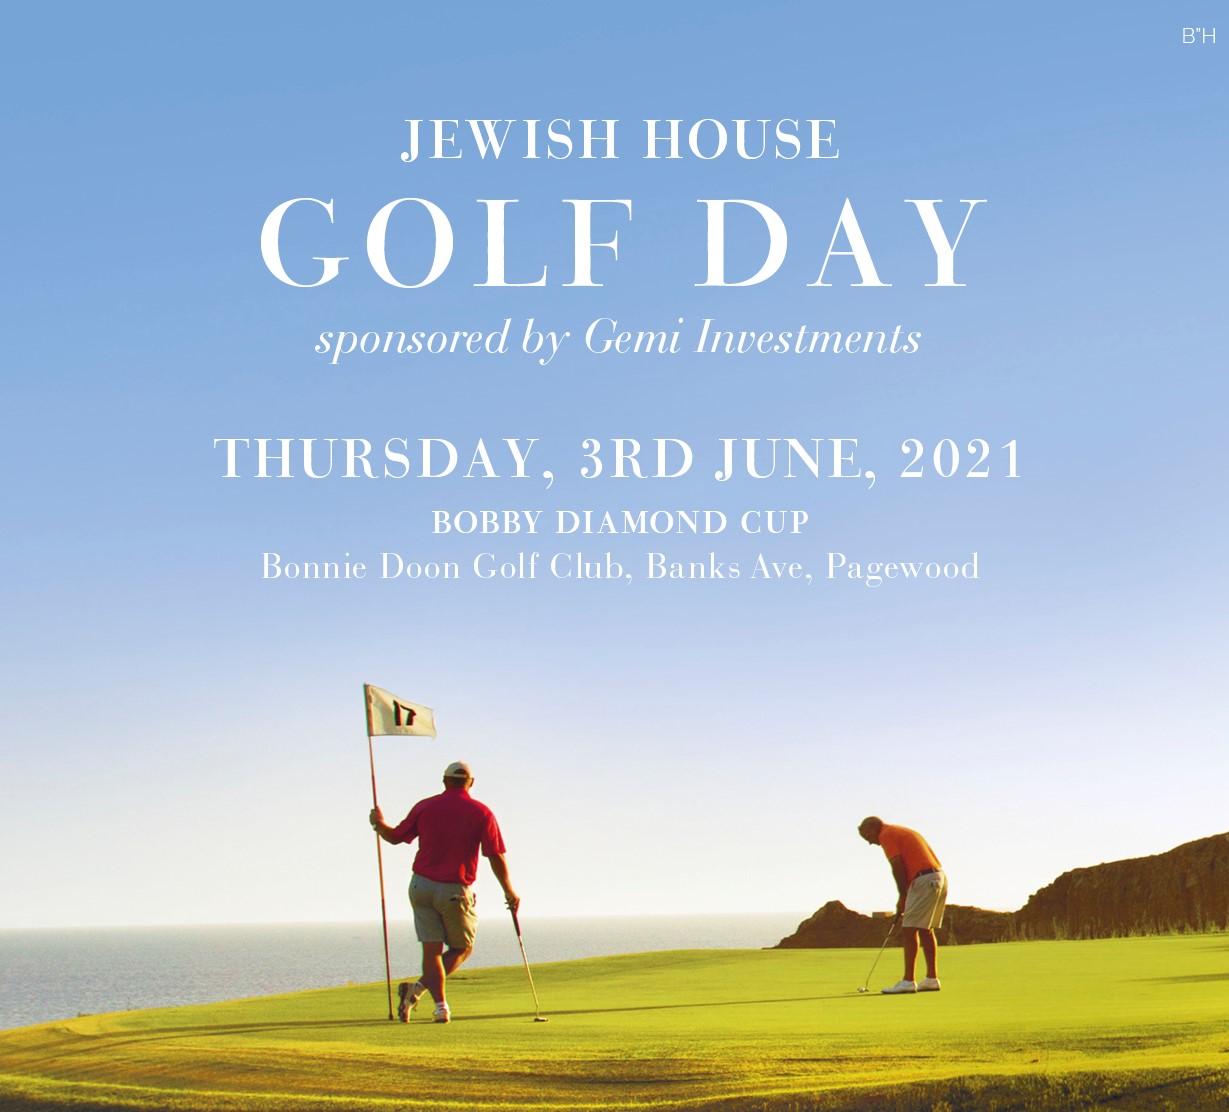 Jewish House Annual Golf Day 2021